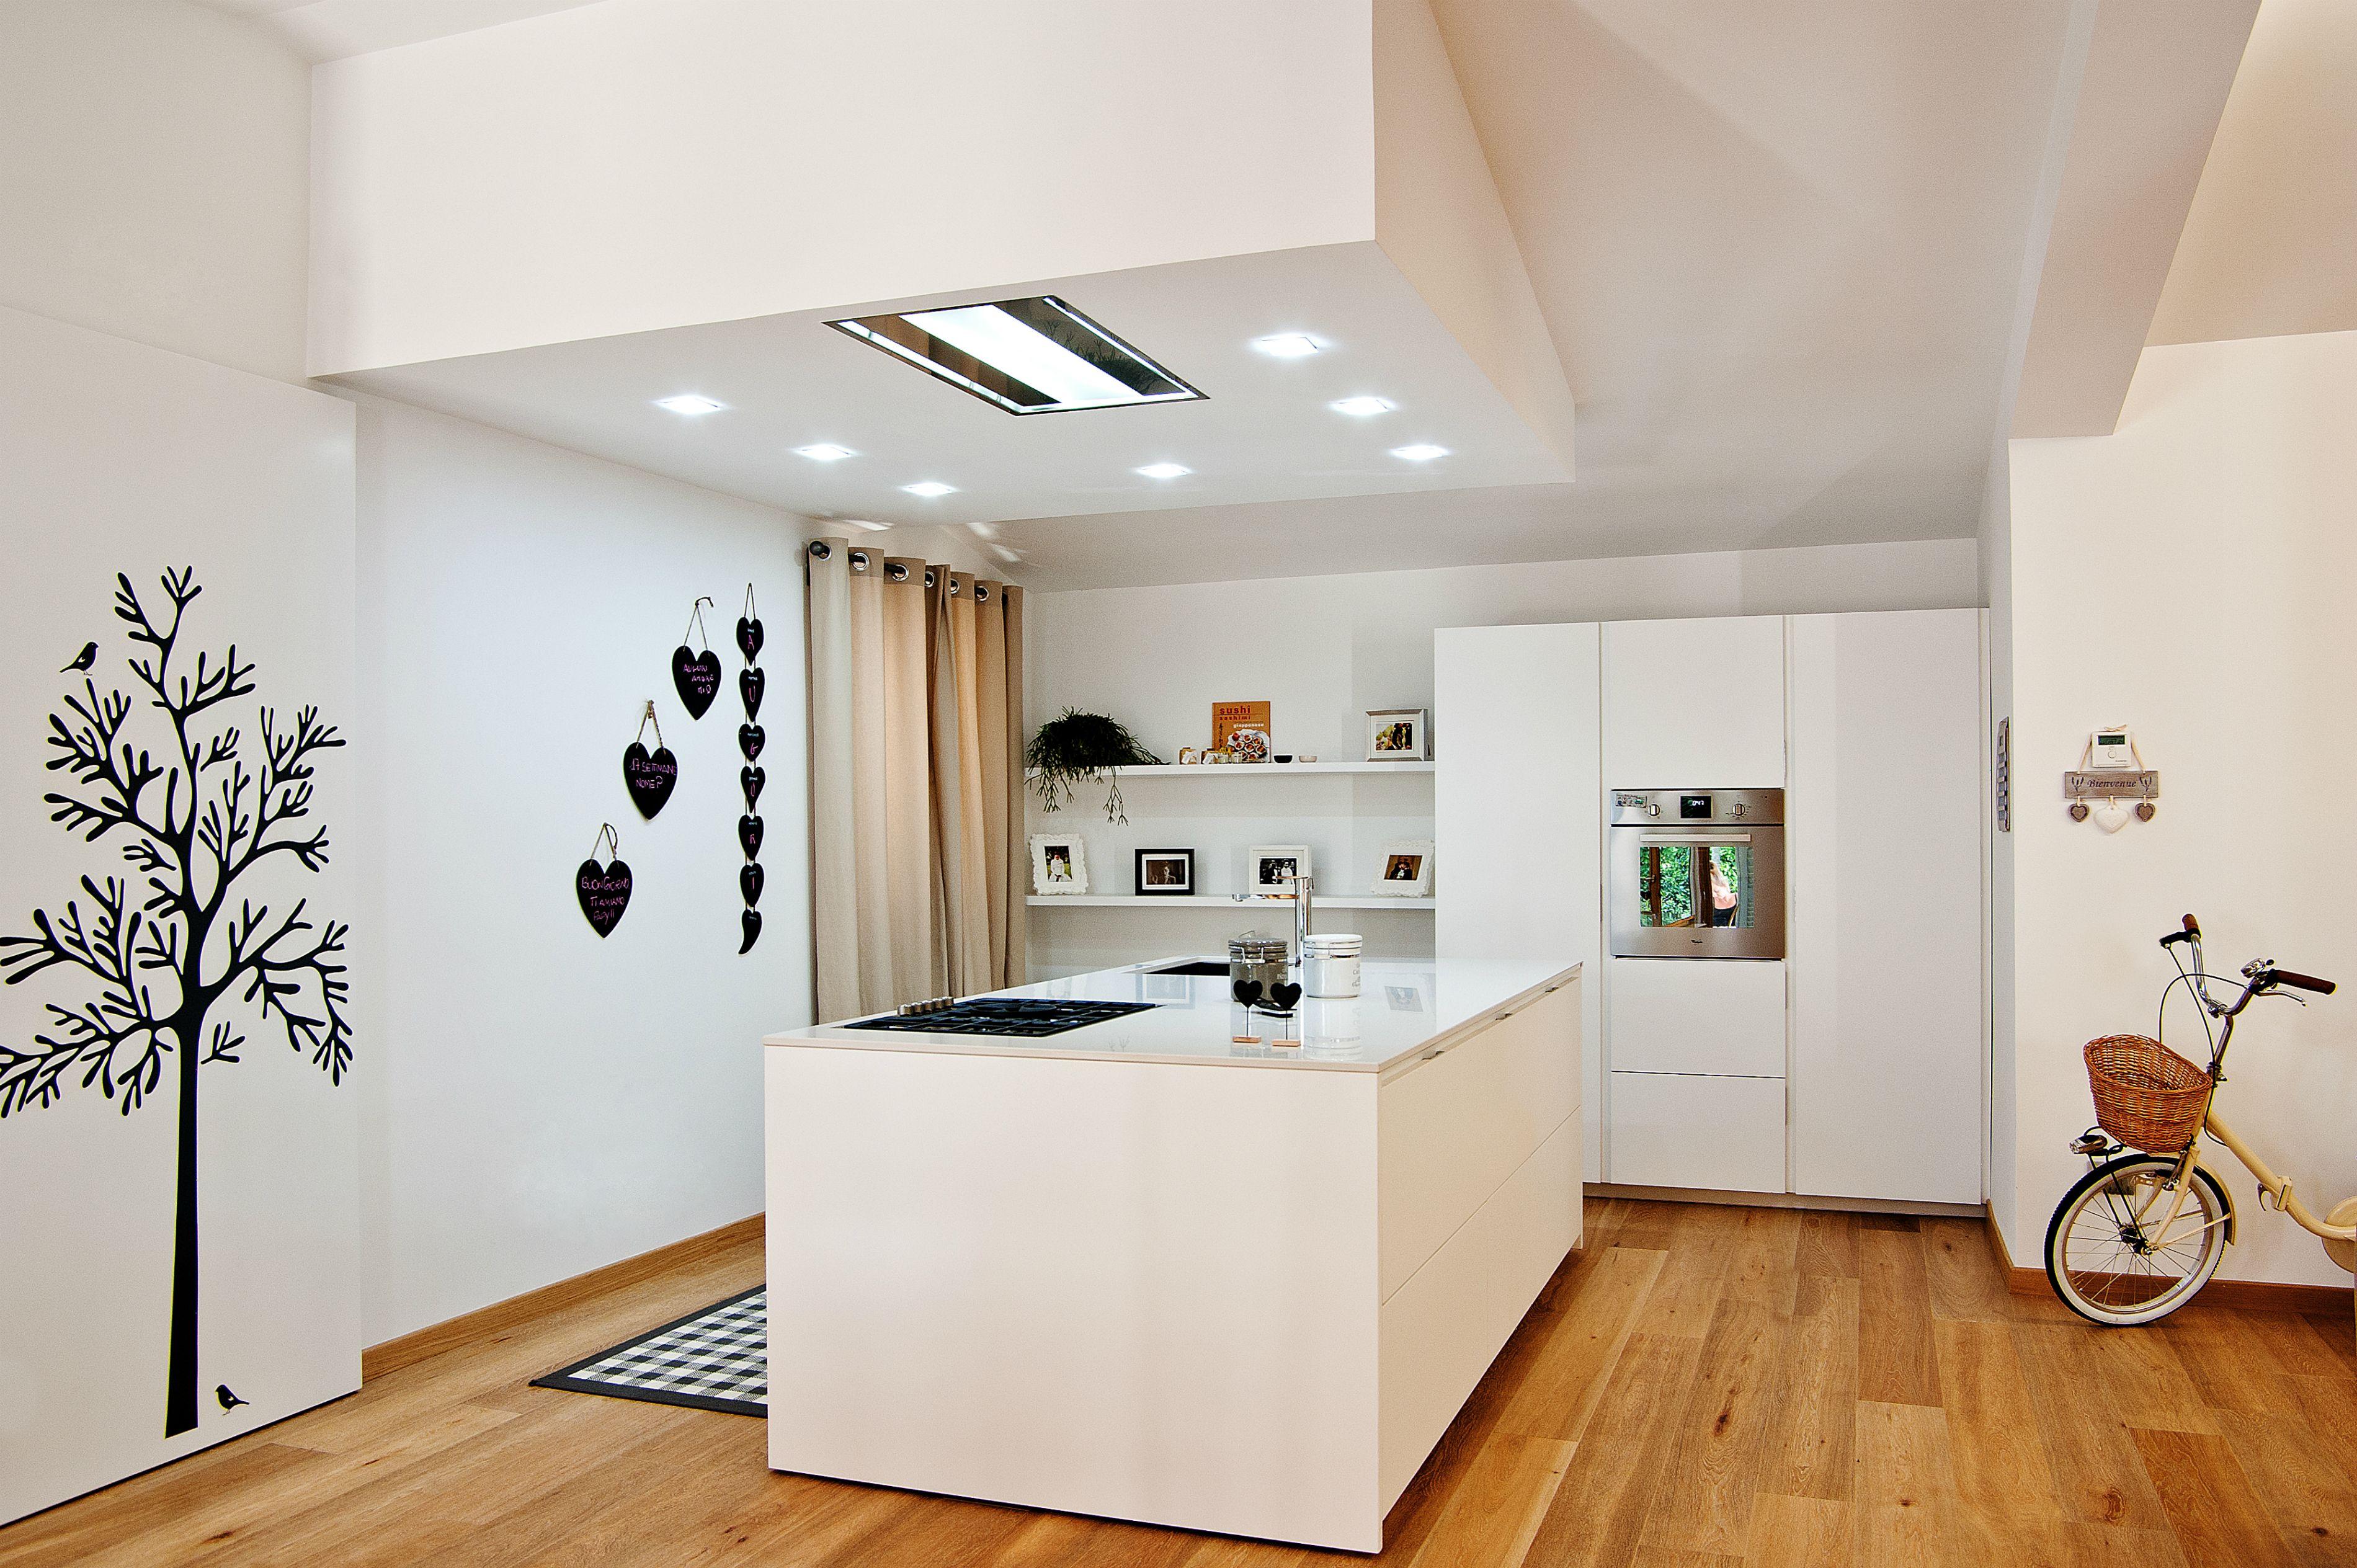 cucina vision di gattocucine laccato bianco lucido, top in okite ... - Cappa Cucina Sospesa